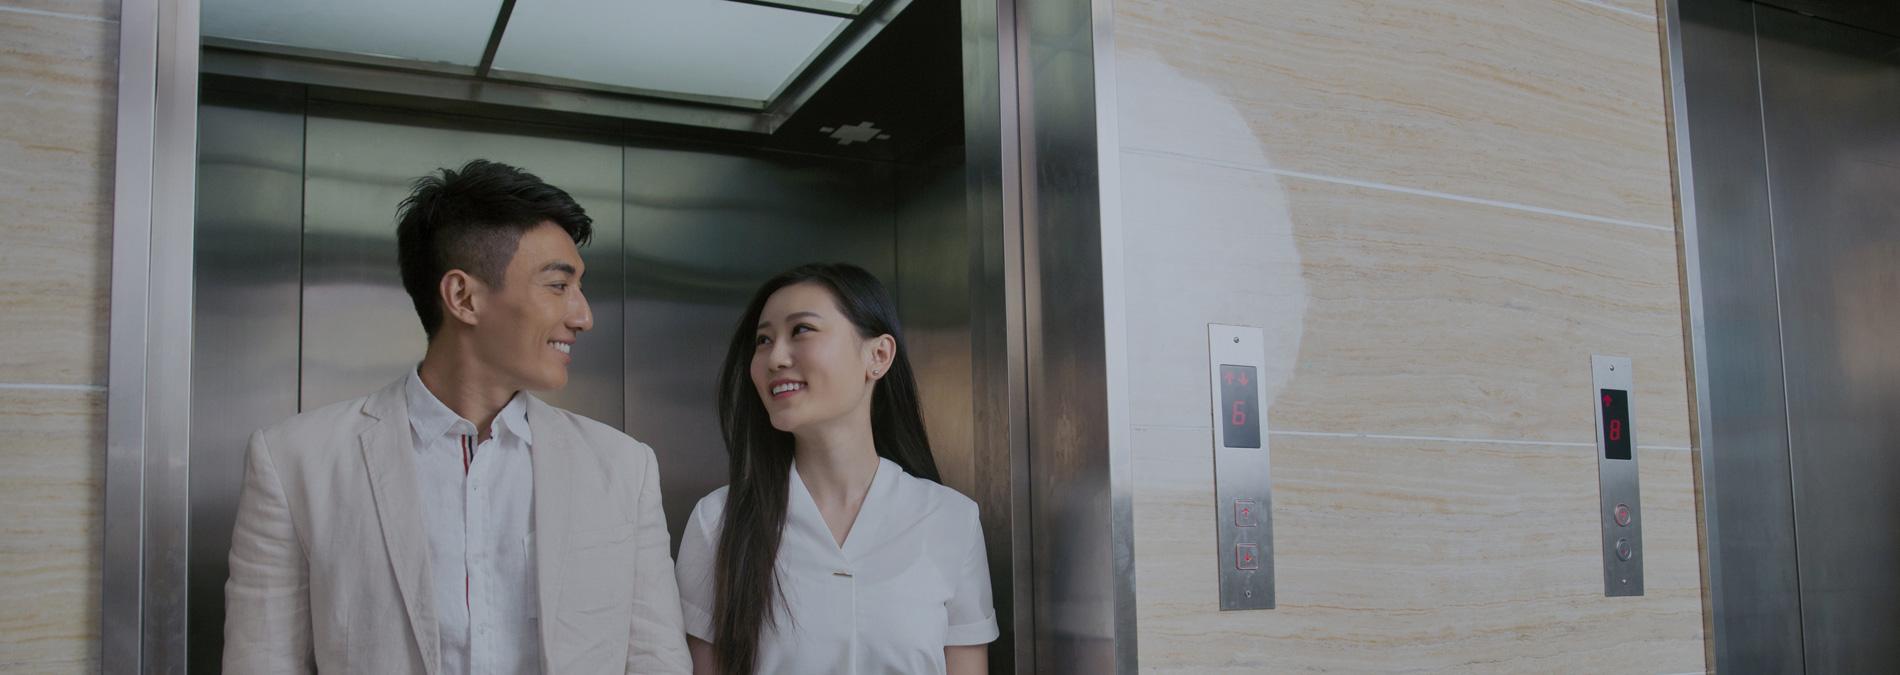 hotel_otis_header